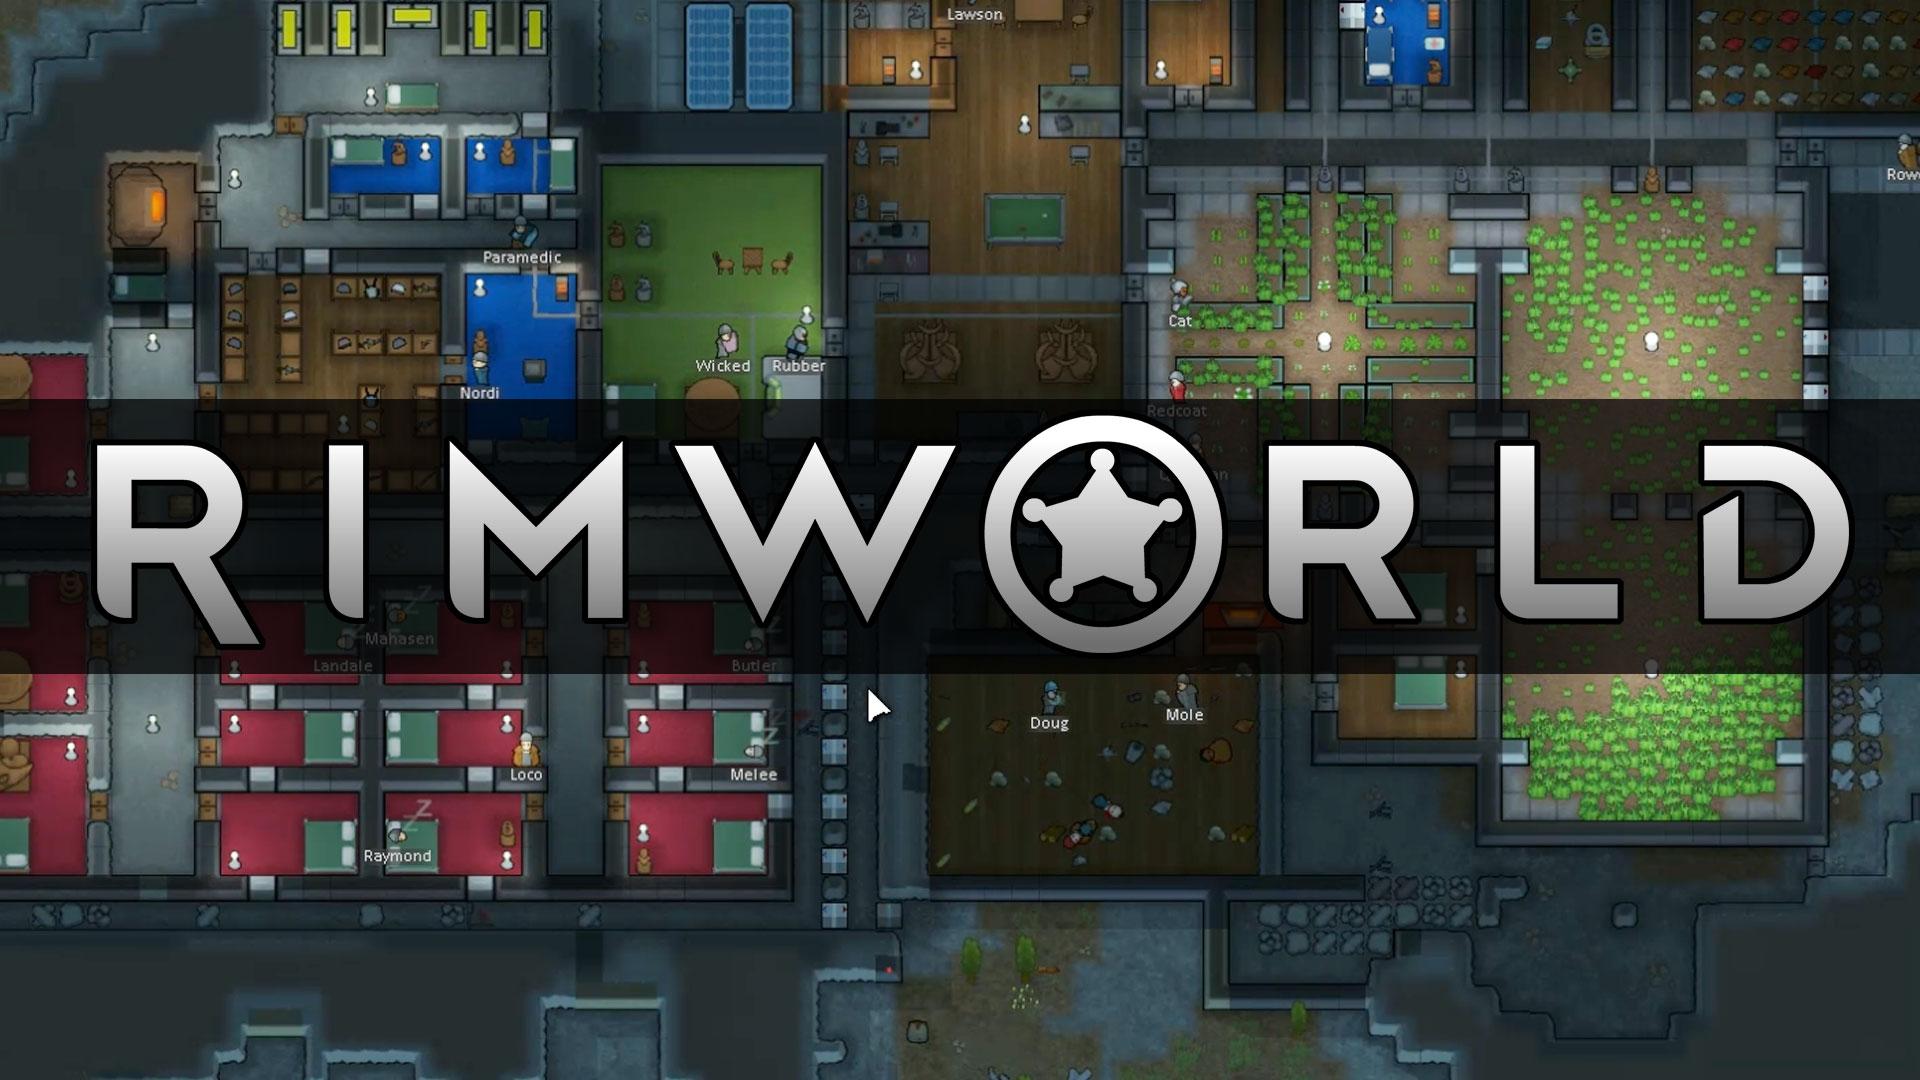 New Rimworld Trailer News - Indie Db-3546